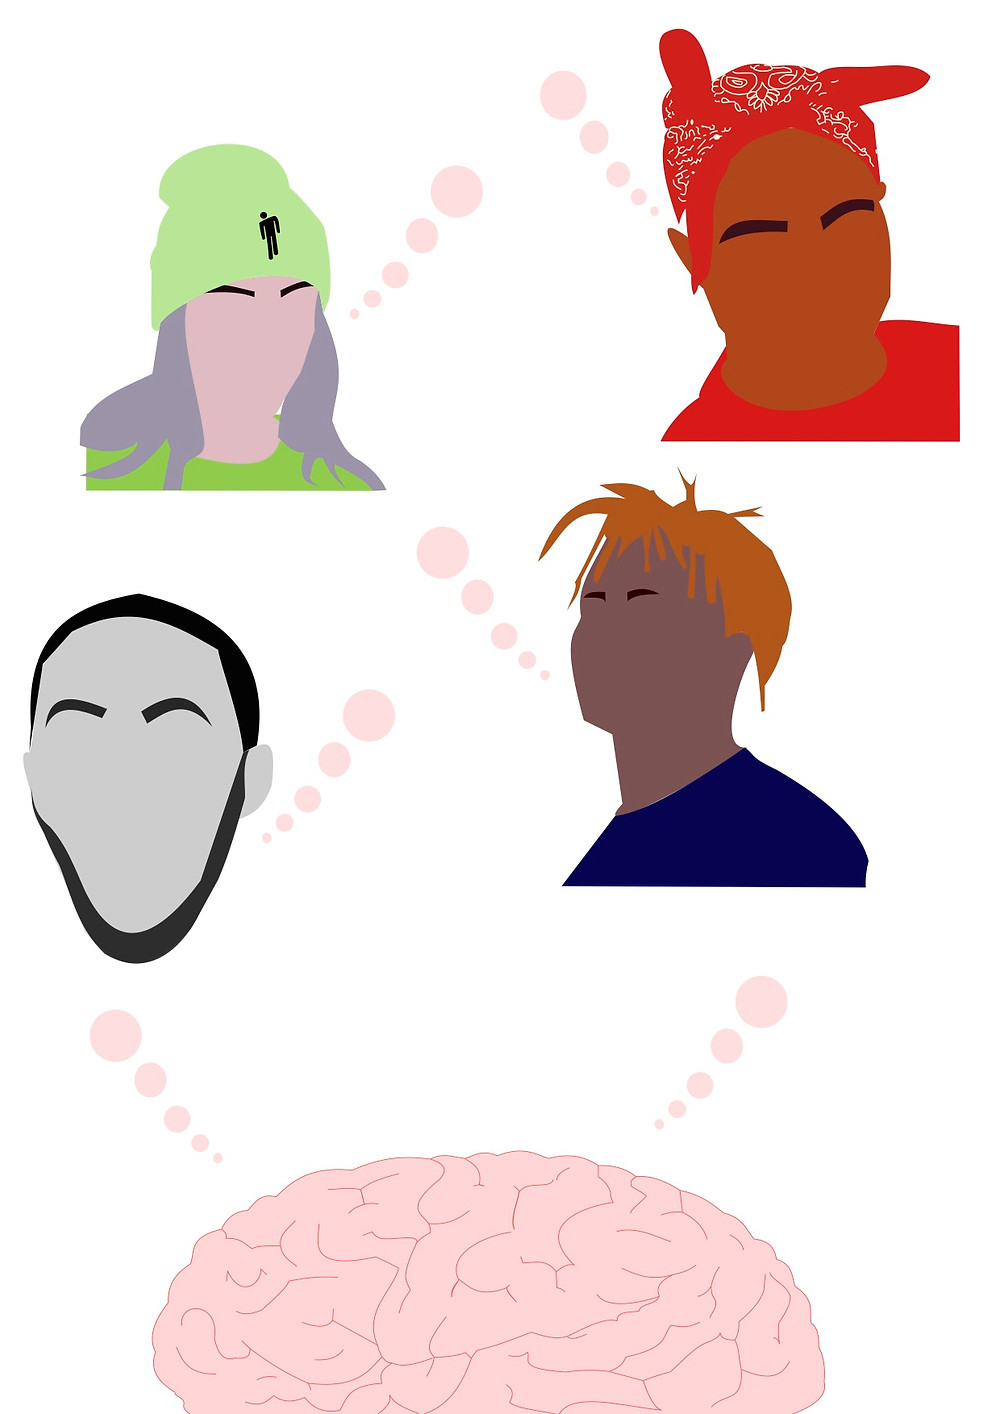 Graphic designed by me featuring Billie Eilish, Tupac Shakur, Mac Miller, & Juice WRLD